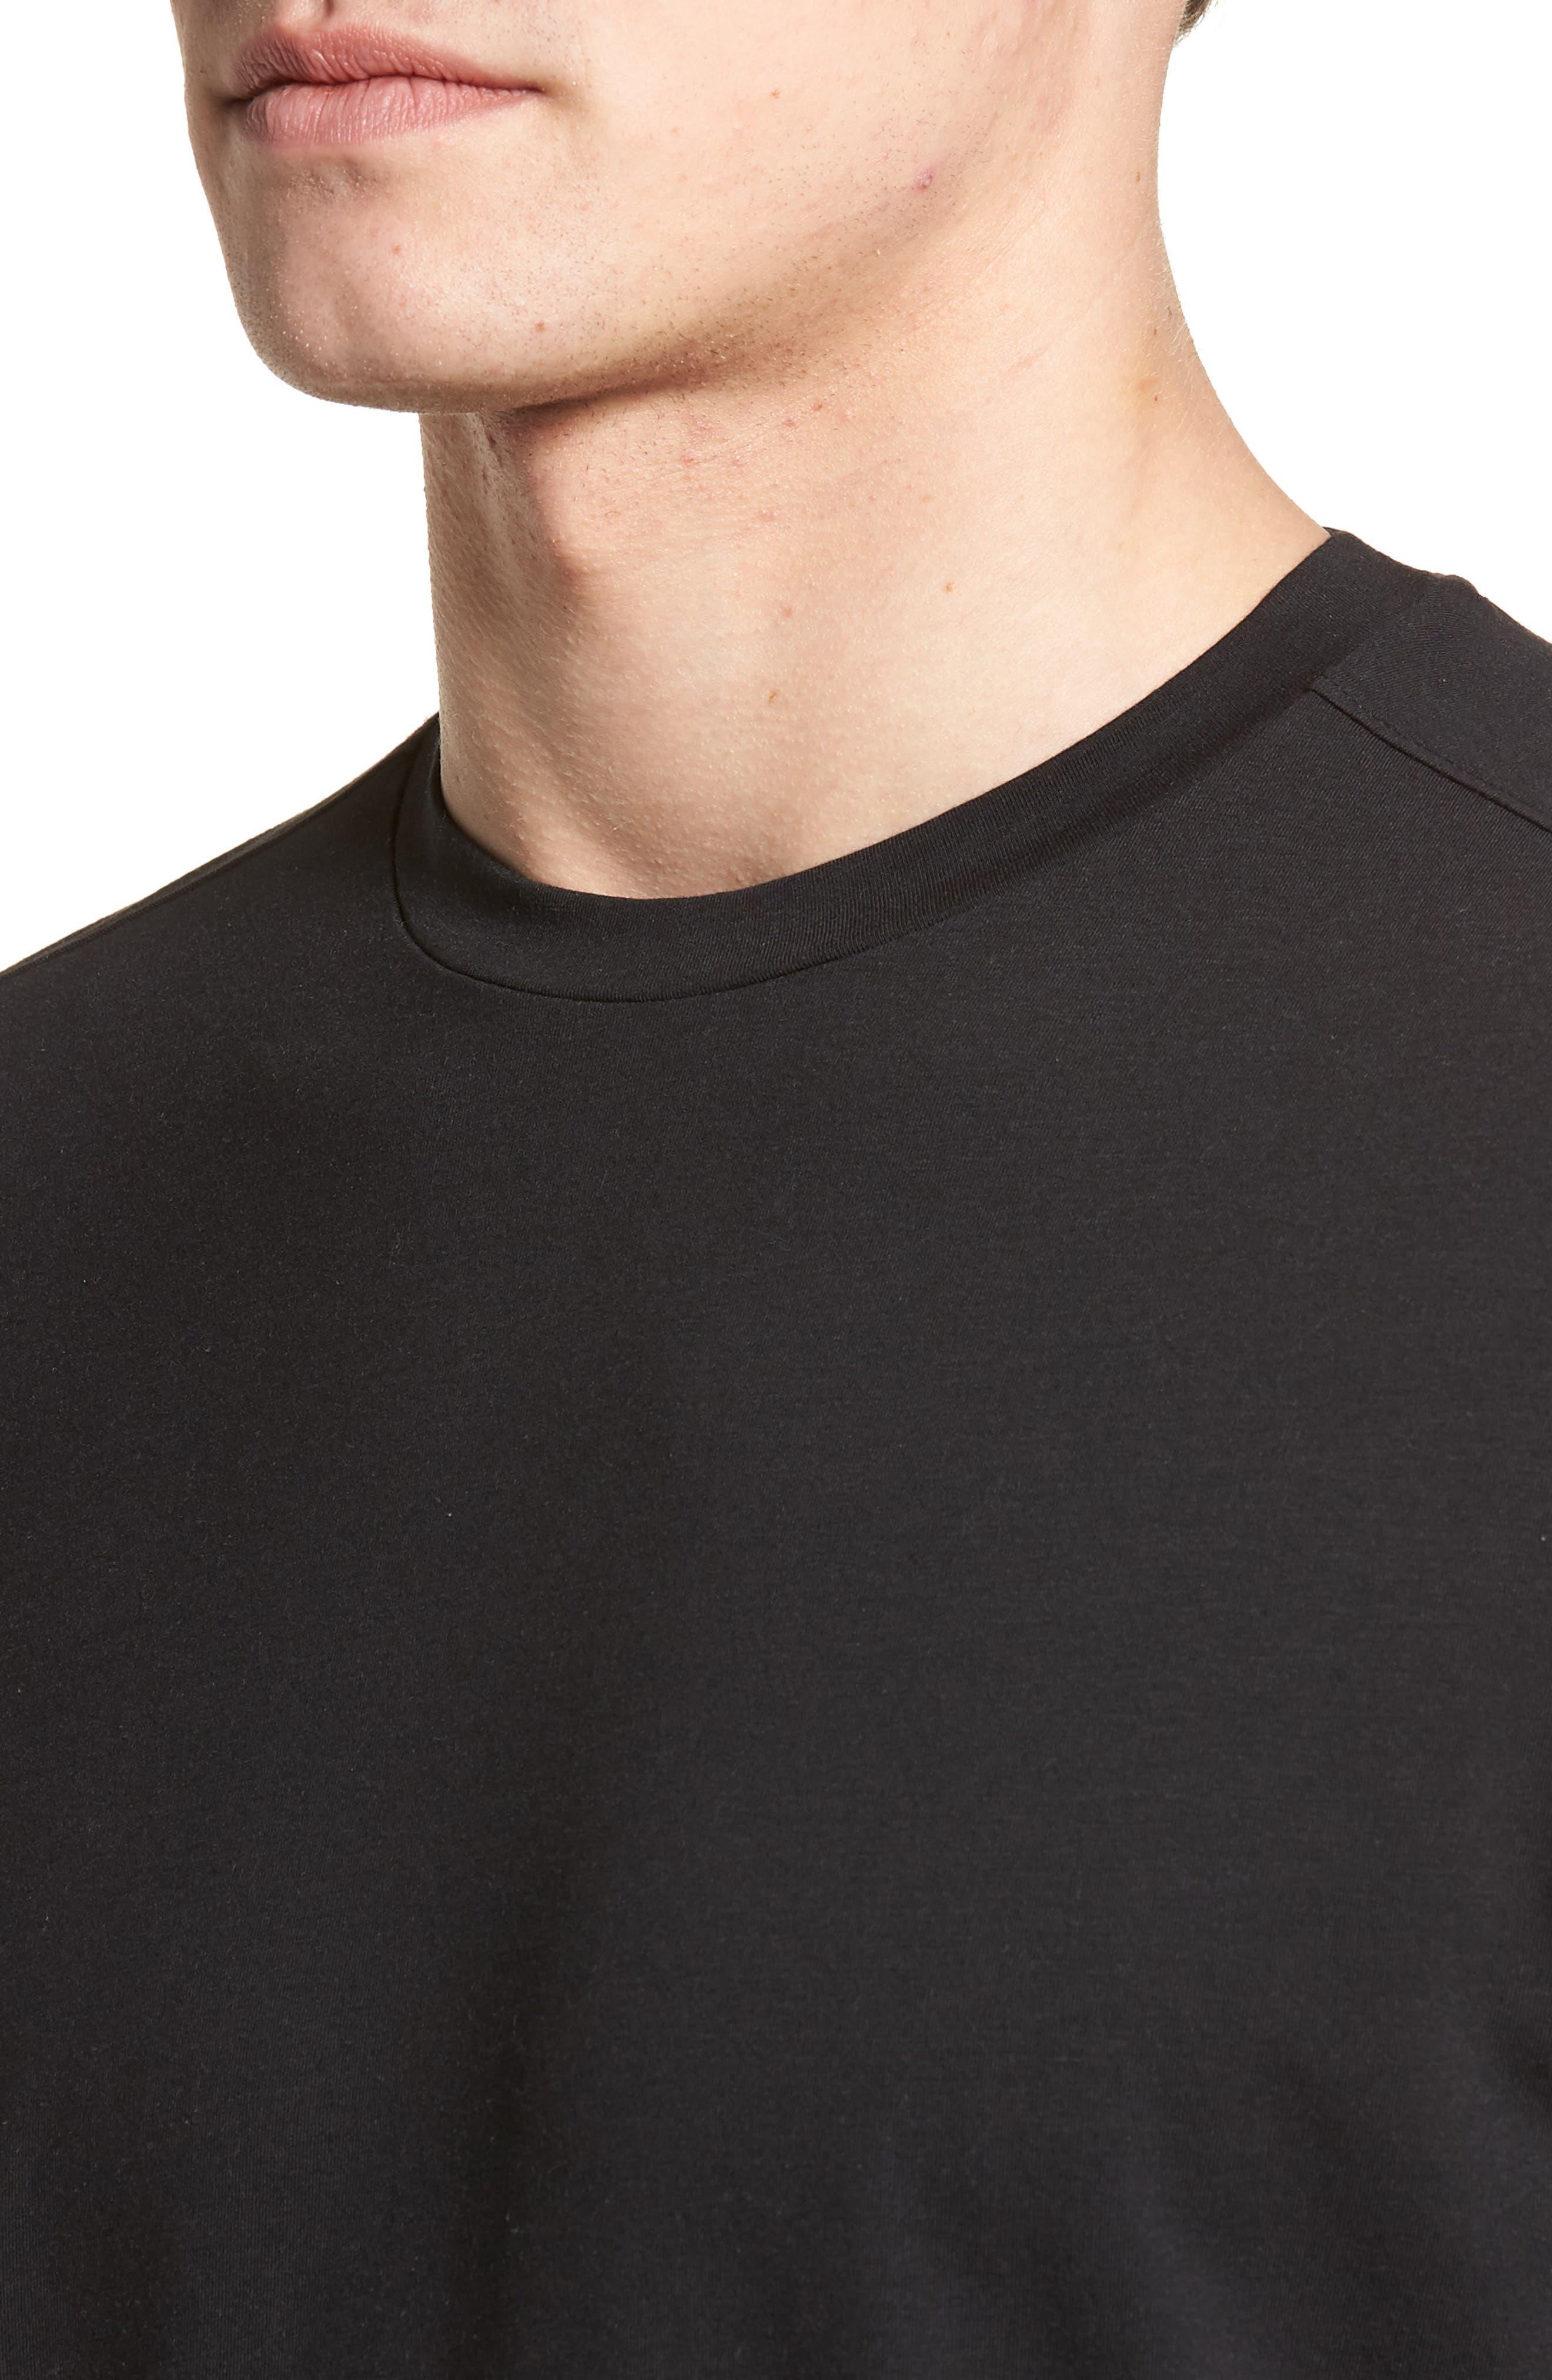 Tropicool T-Shirt,                             Alternate thumbnail 4, color,                             001